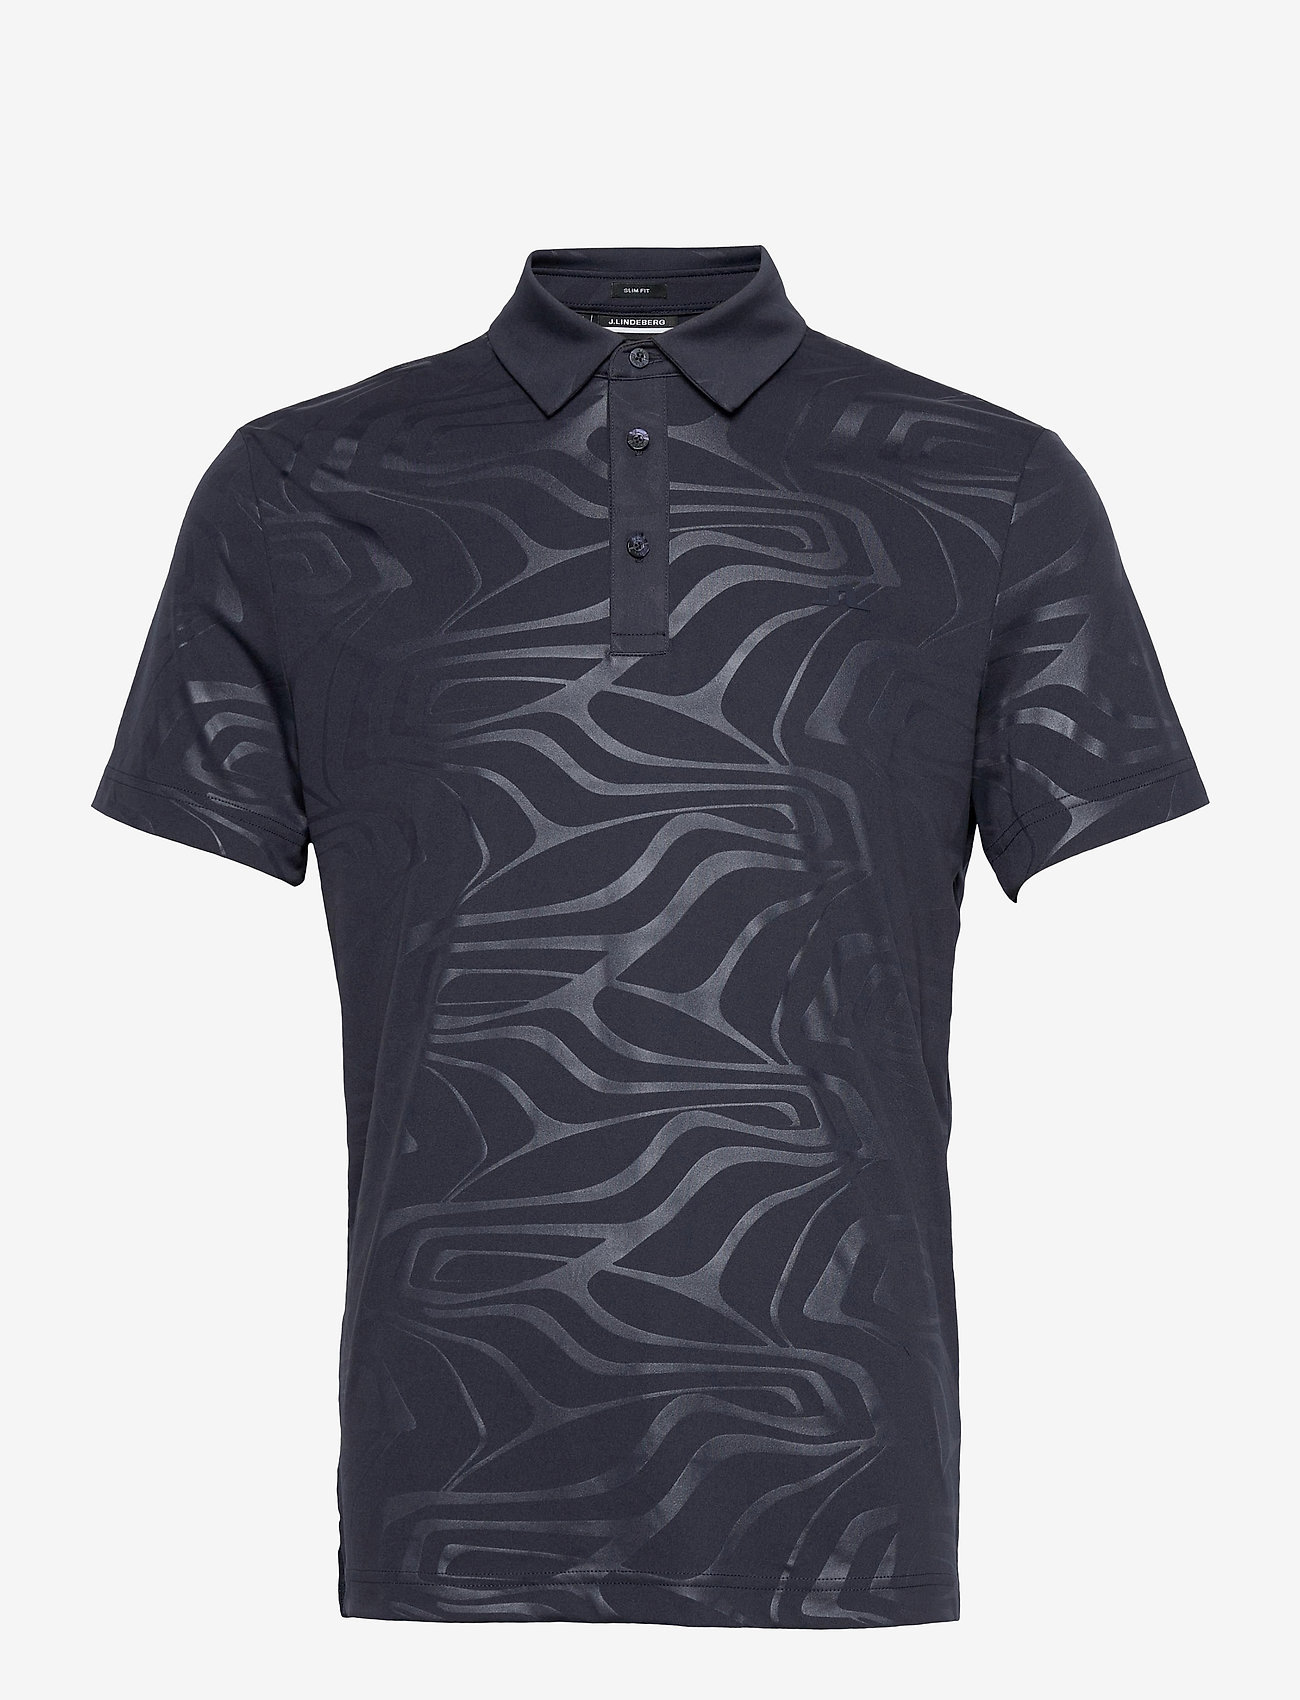 J. Lindeberg Golf - Tony Slim Fit Golf Polo Print - kurzärmelig - neo deboss navy - 1